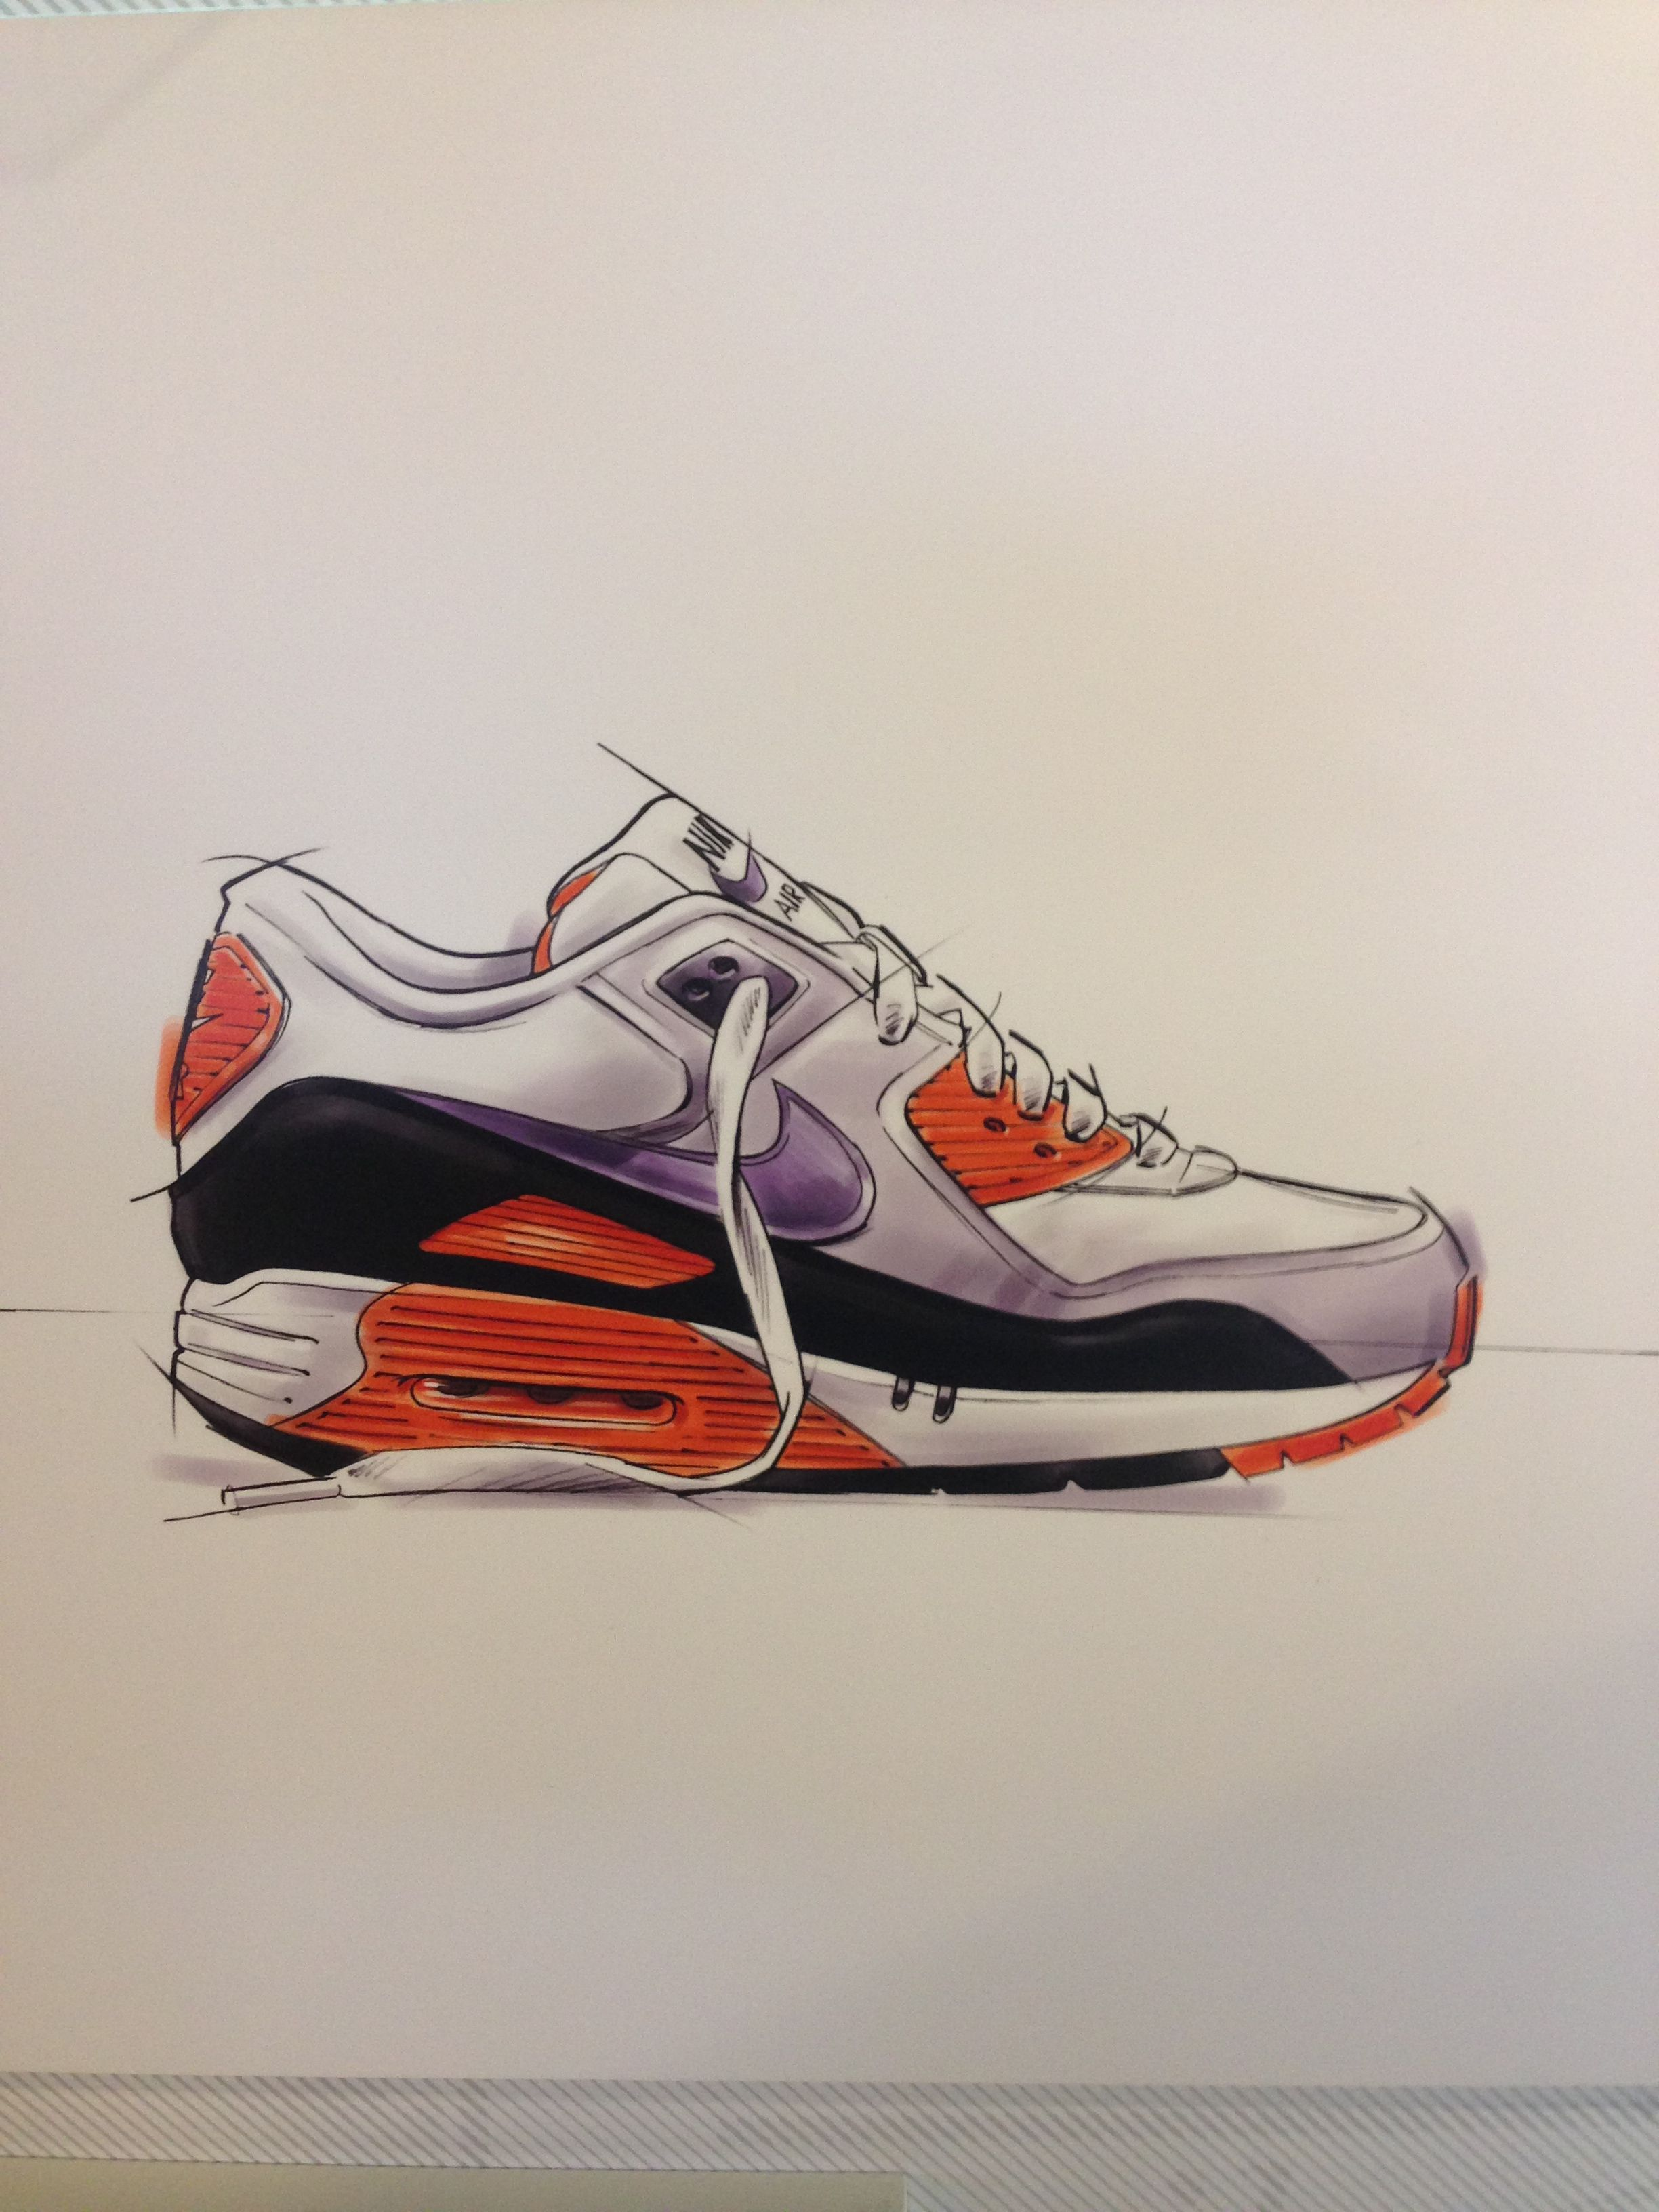 944af6f3428 Air Max 90 drawing